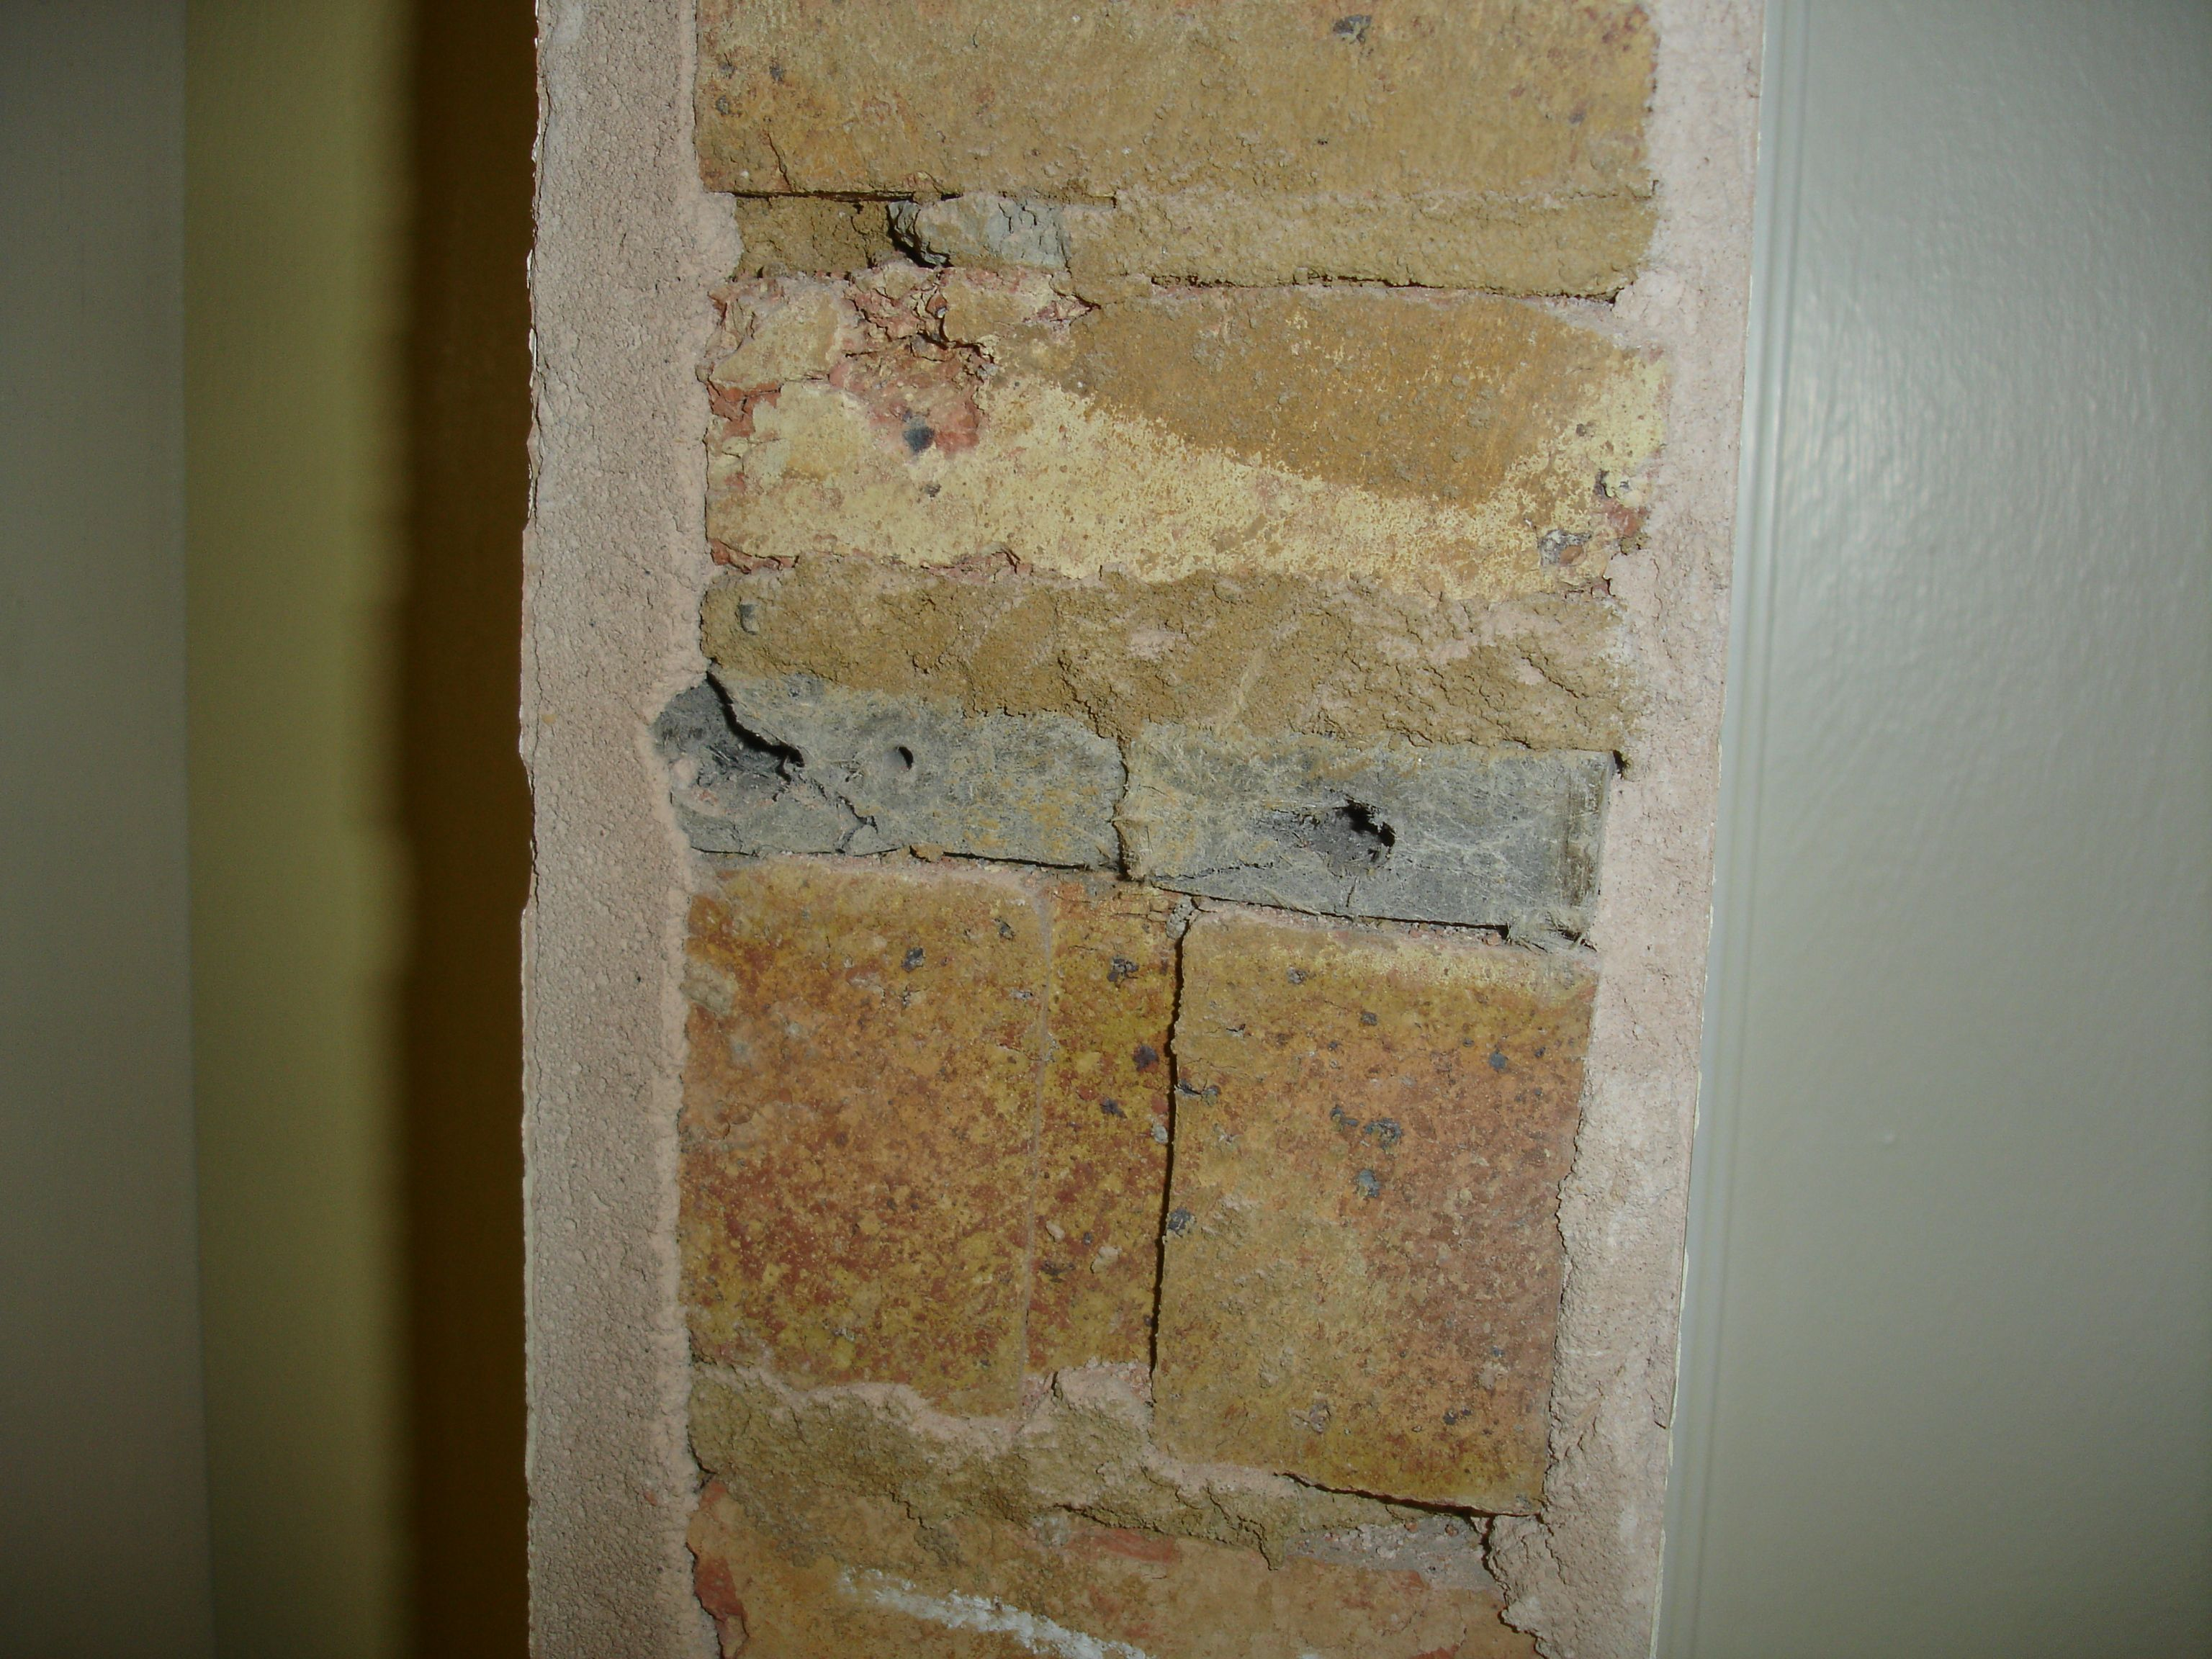 Asbestos Fixing Blocks Embedded In Brickwork Identified On Removal Of Door Frame Asbestos Mesothelioma Basic Facts